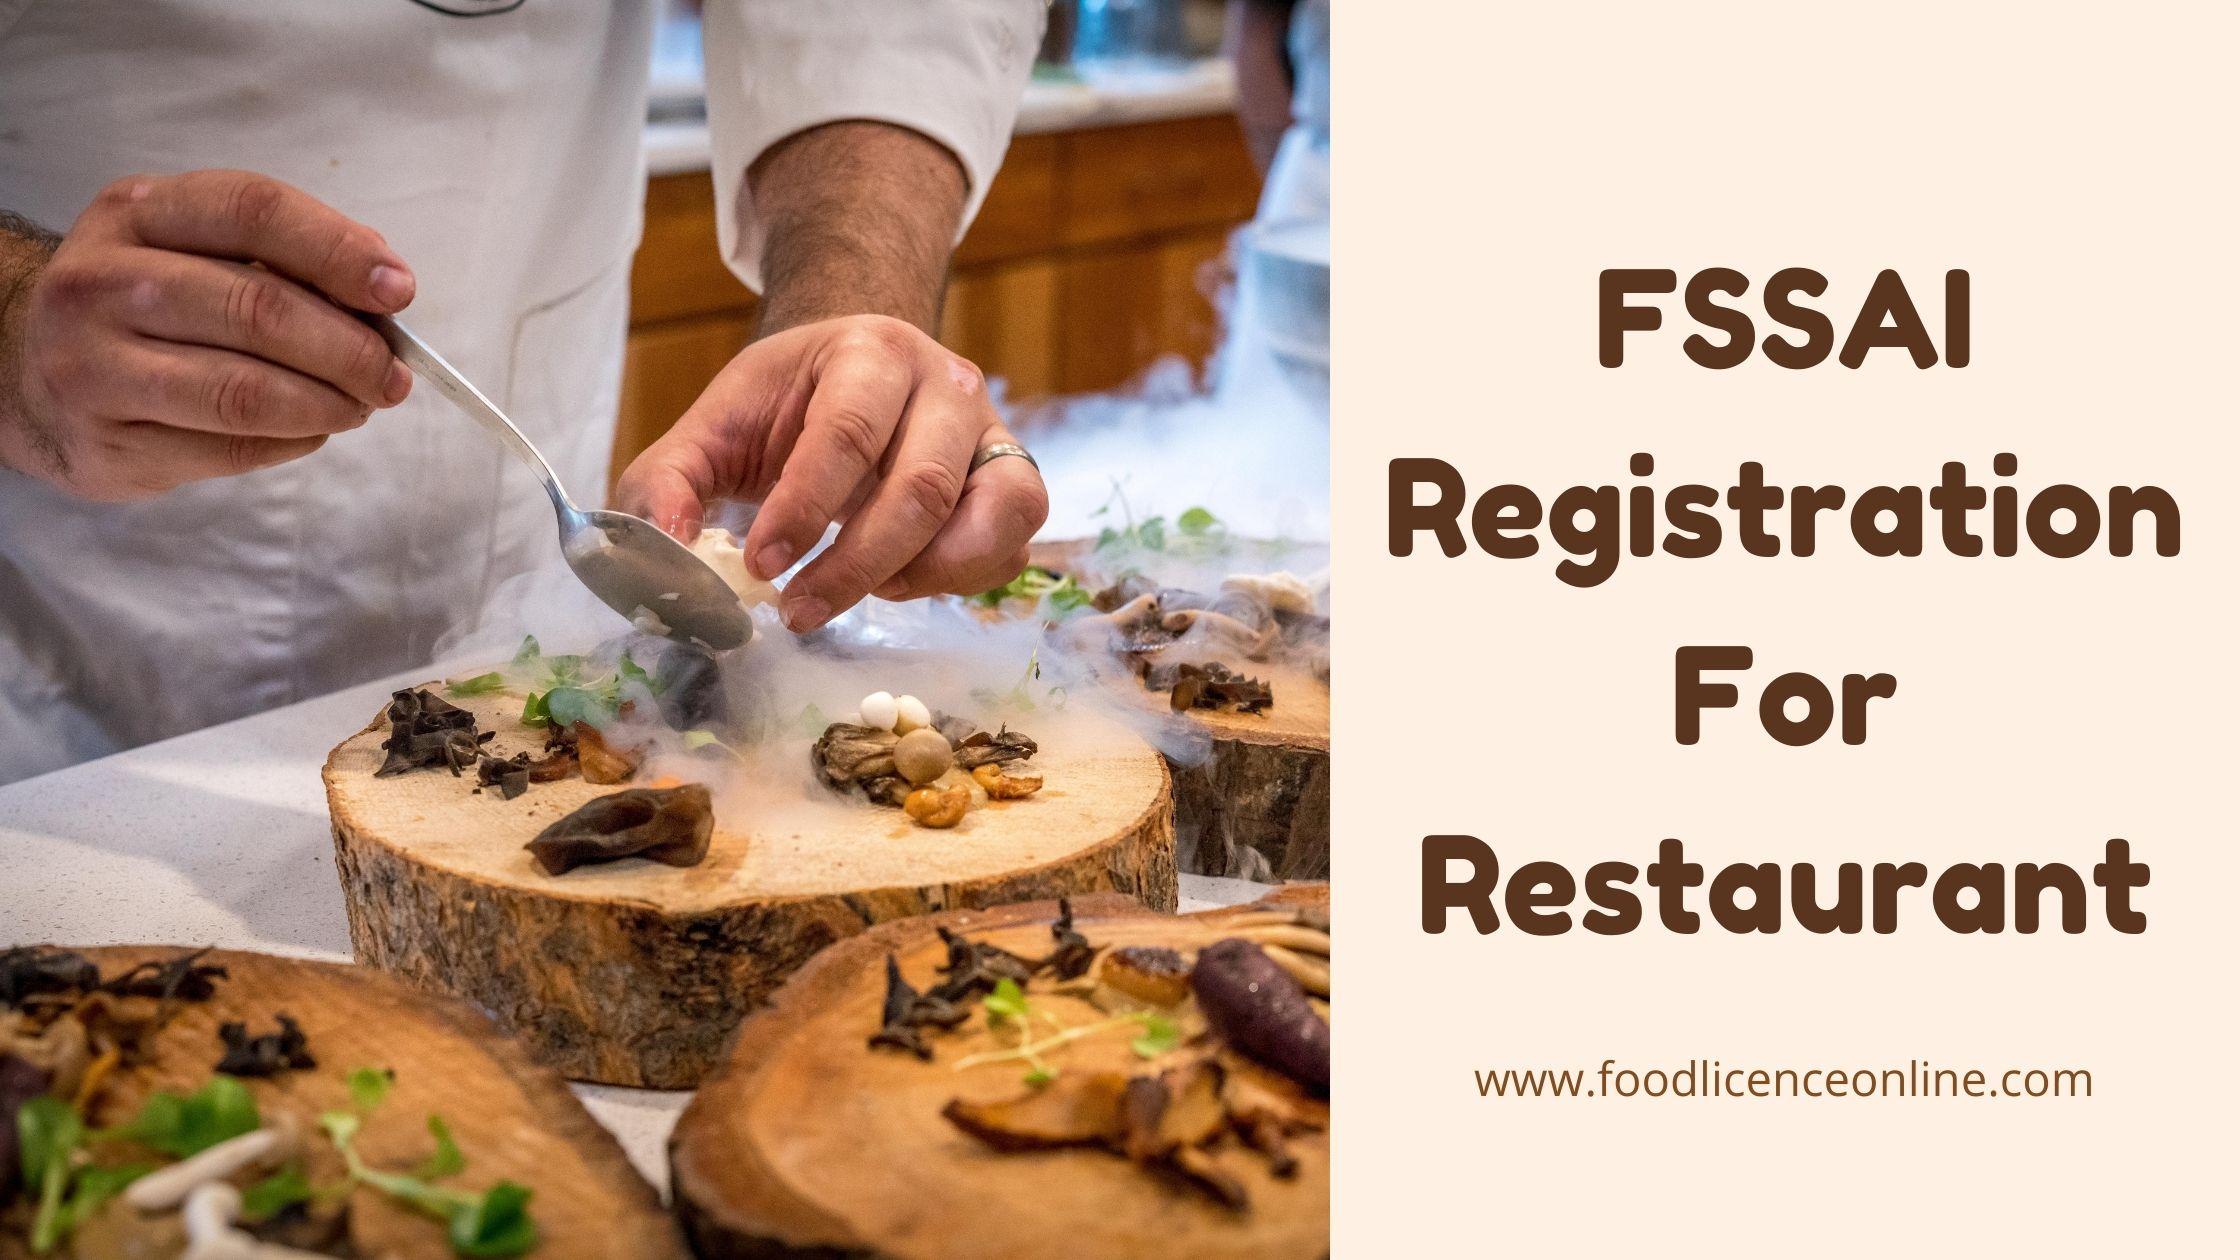 FSSAI License Registration For Restaurant